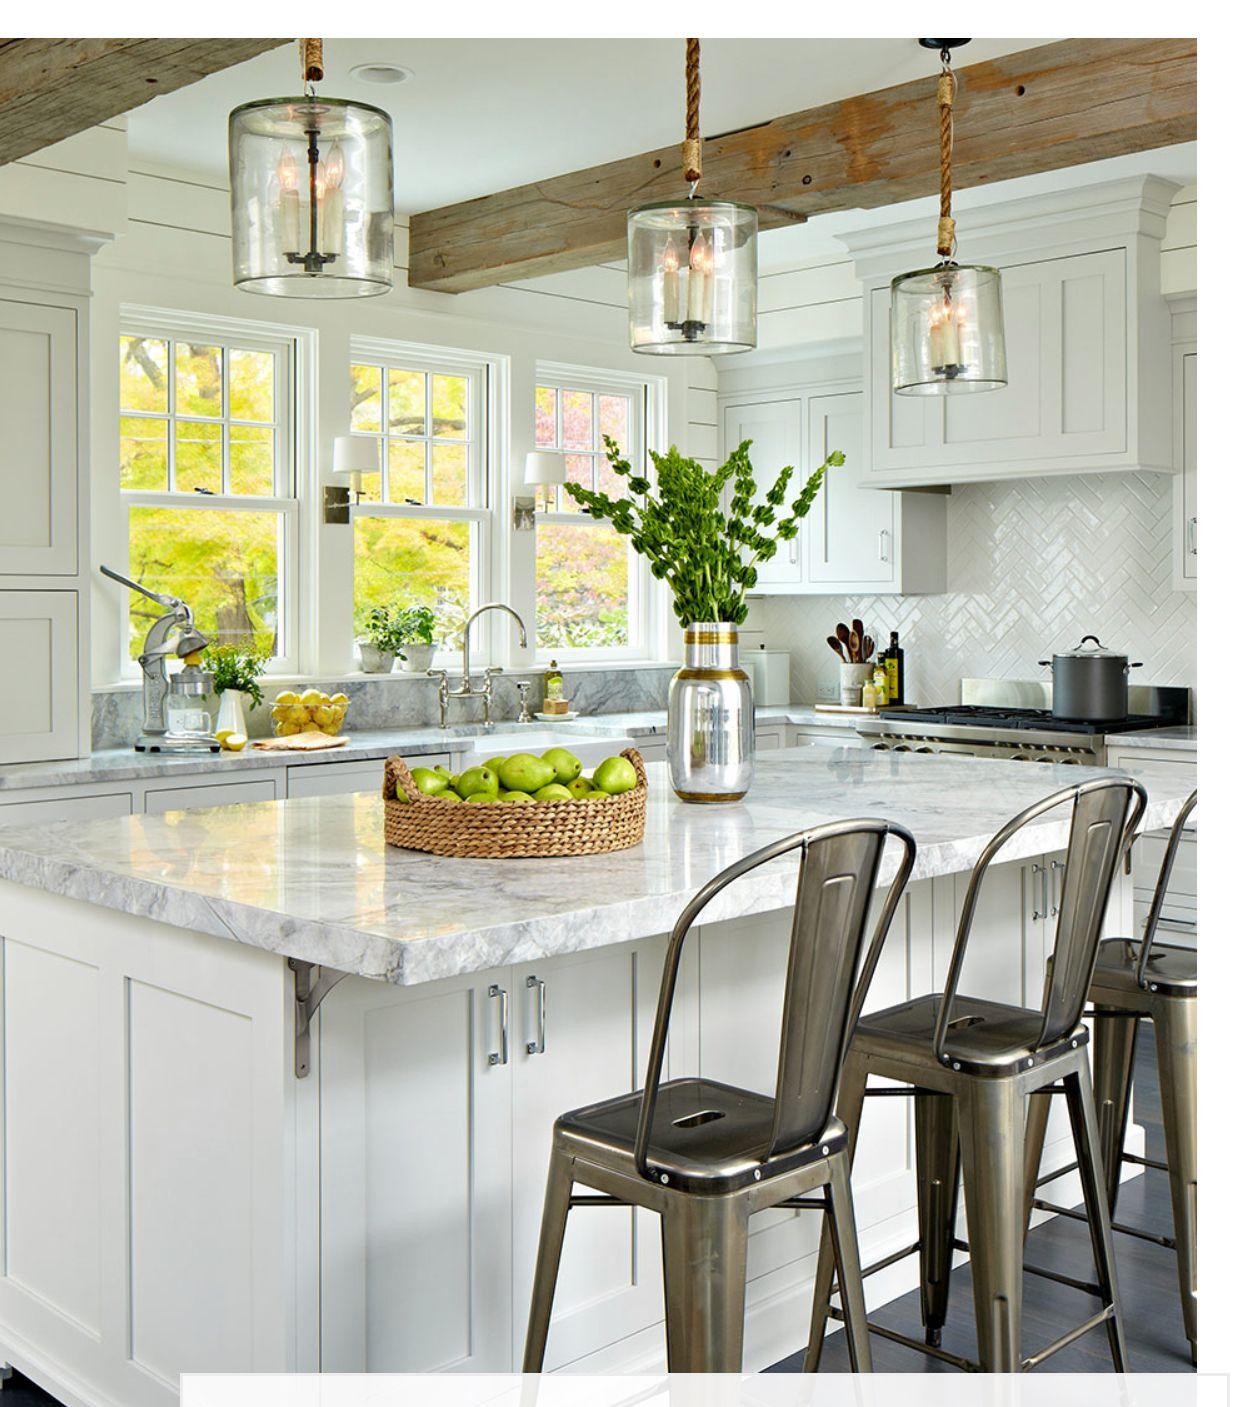 The Kitchen Stools for kitchen island, Kitchen island